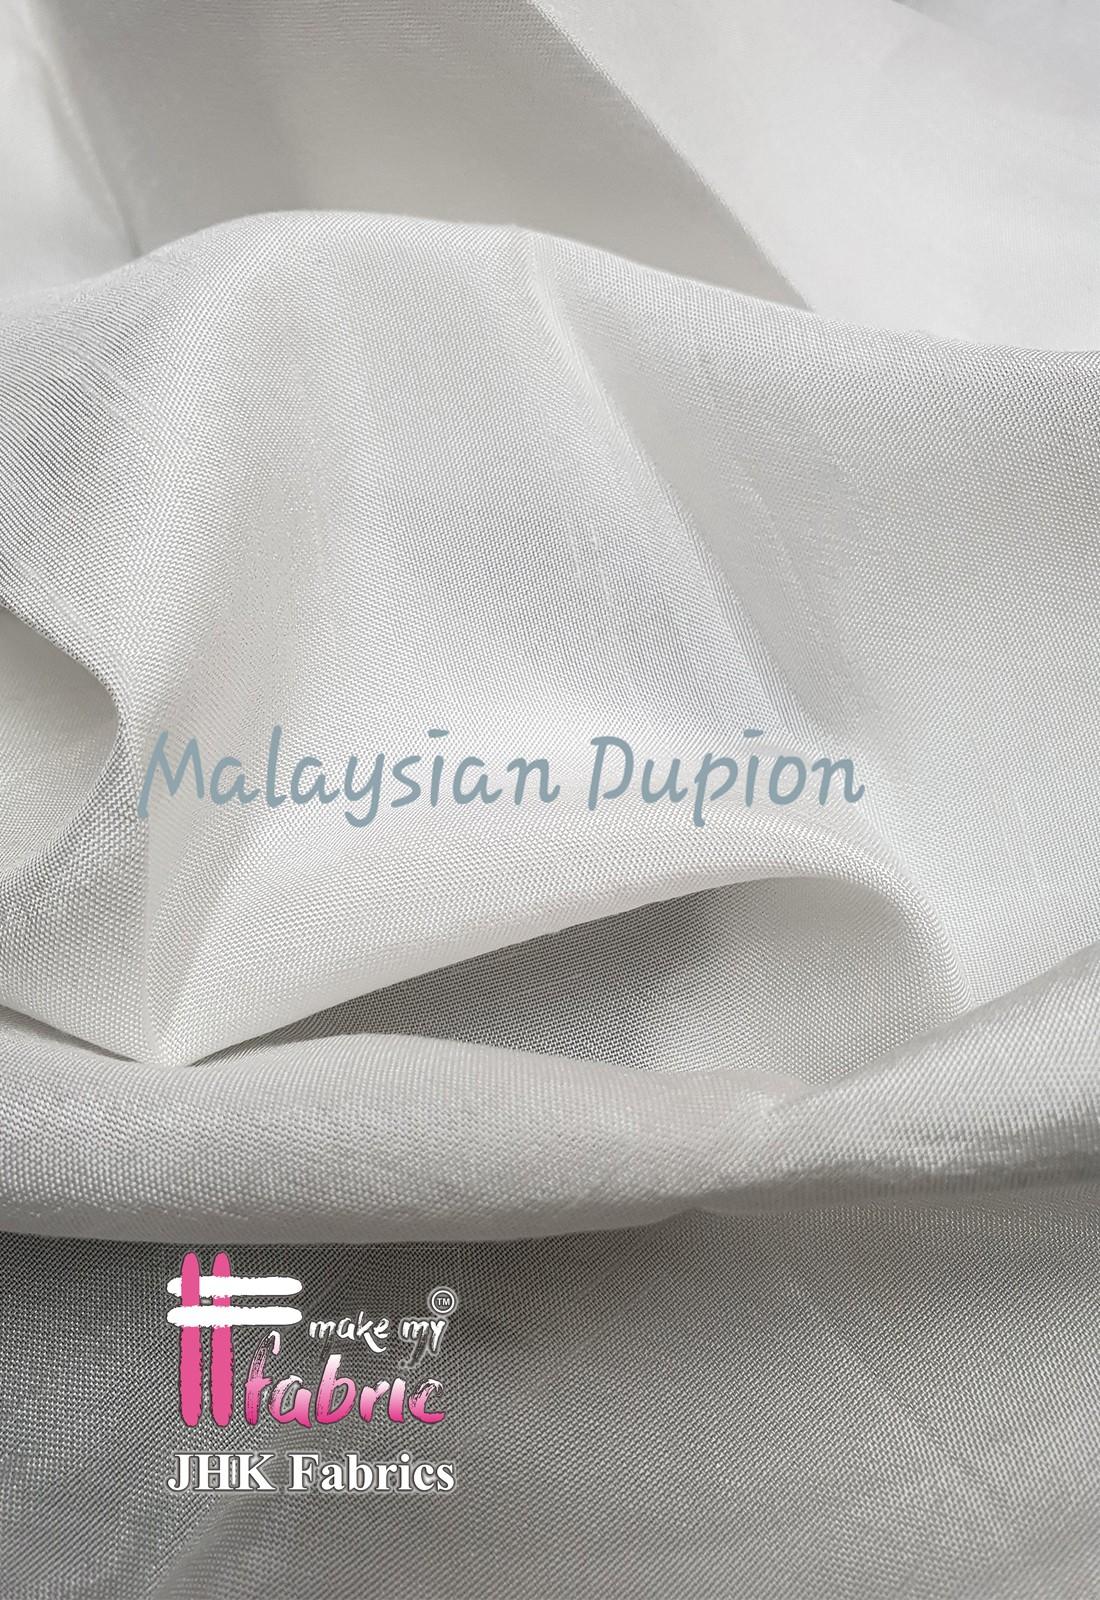 Malaysian Dupion